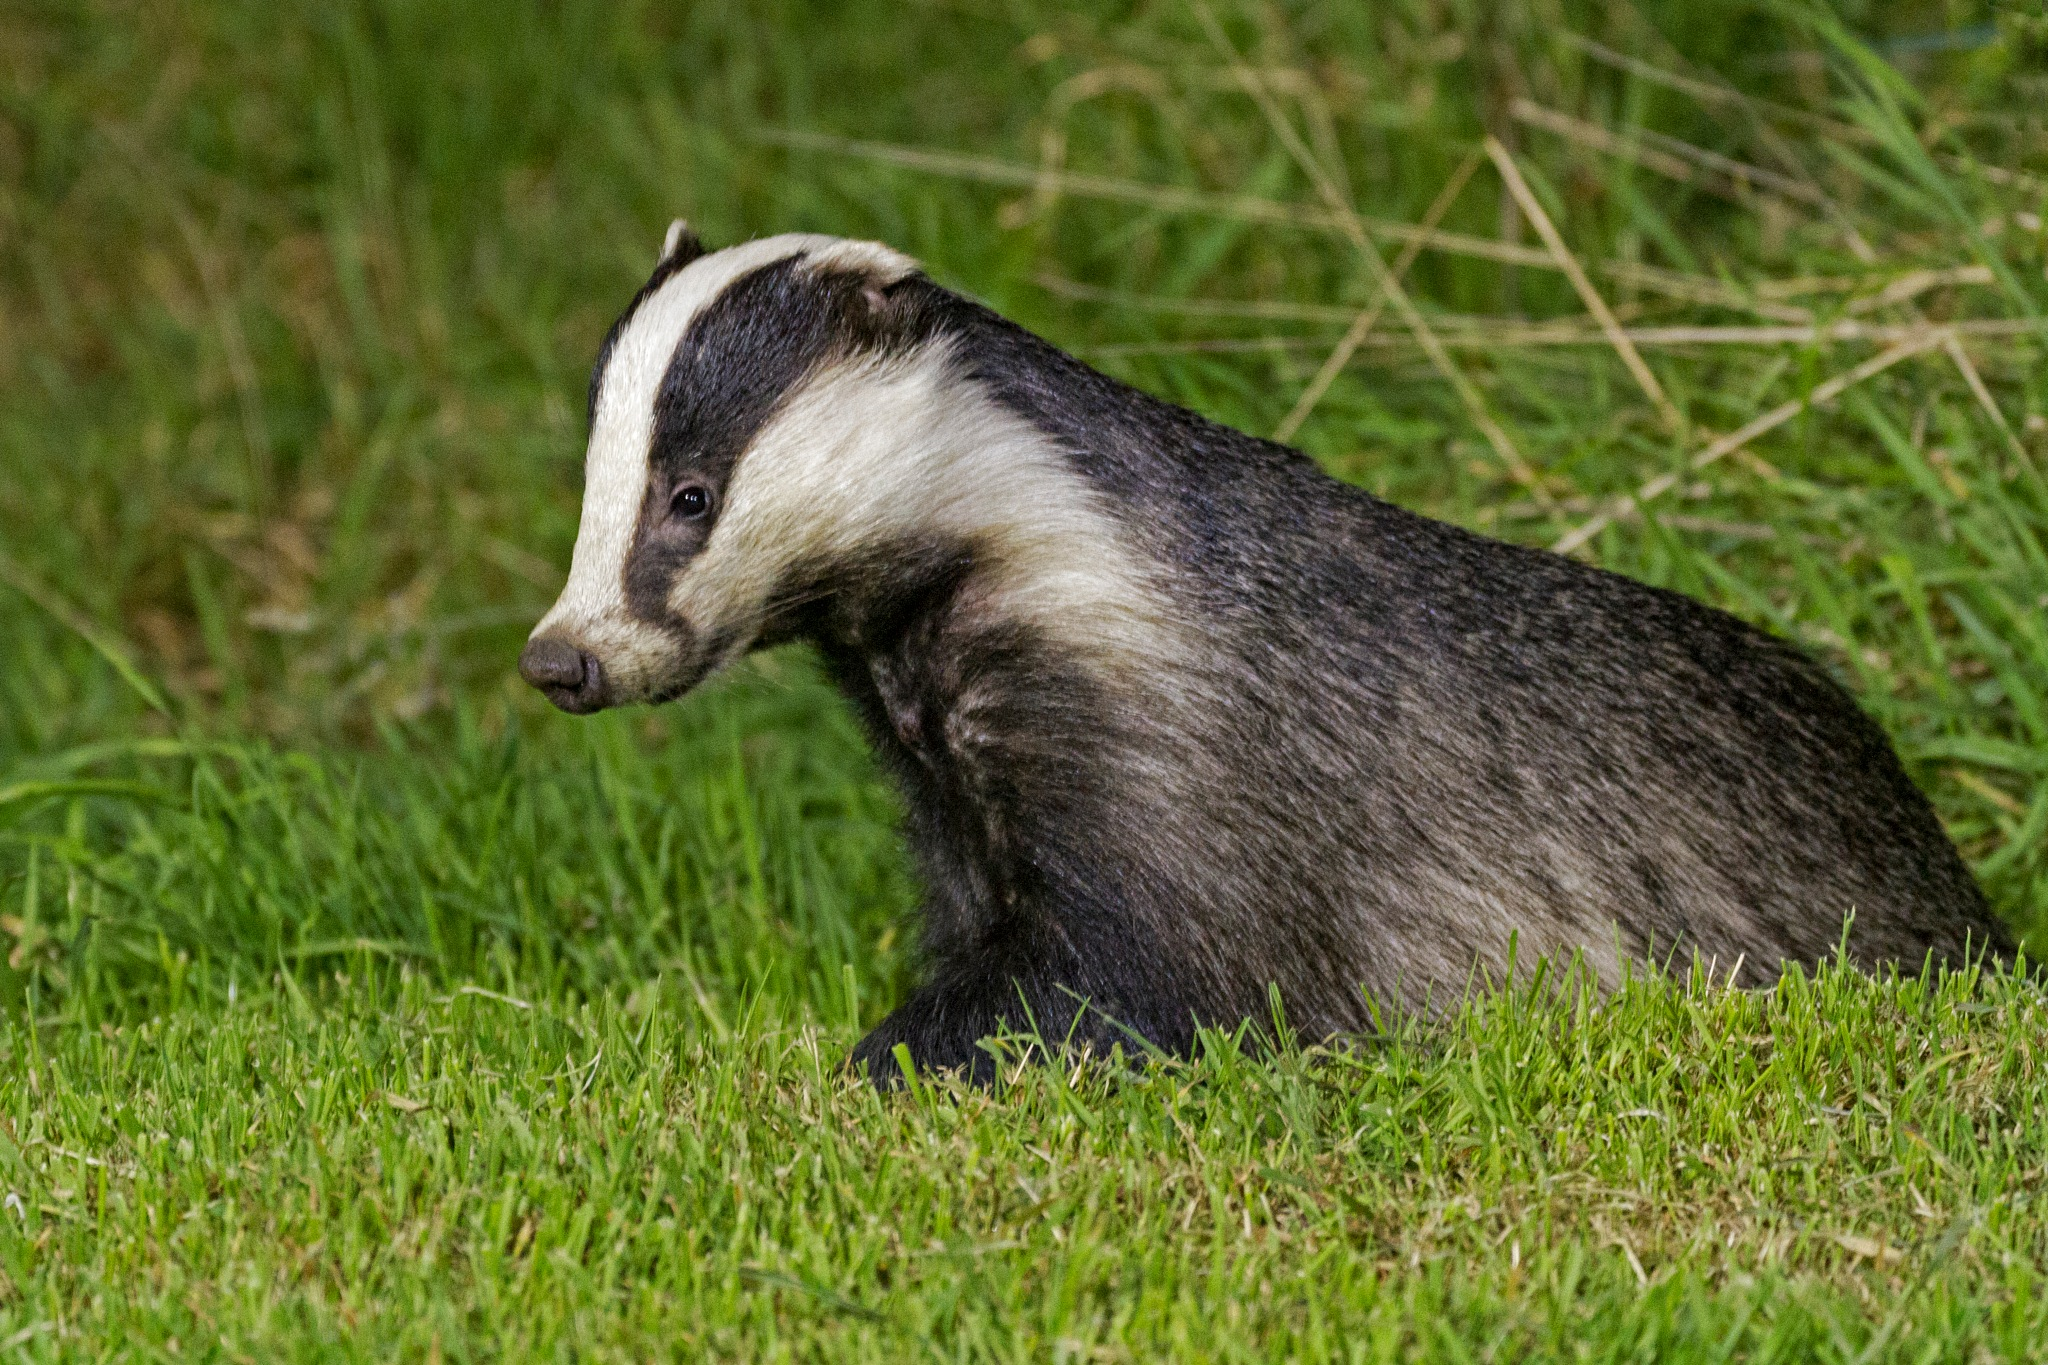 Badger by cathywarne3